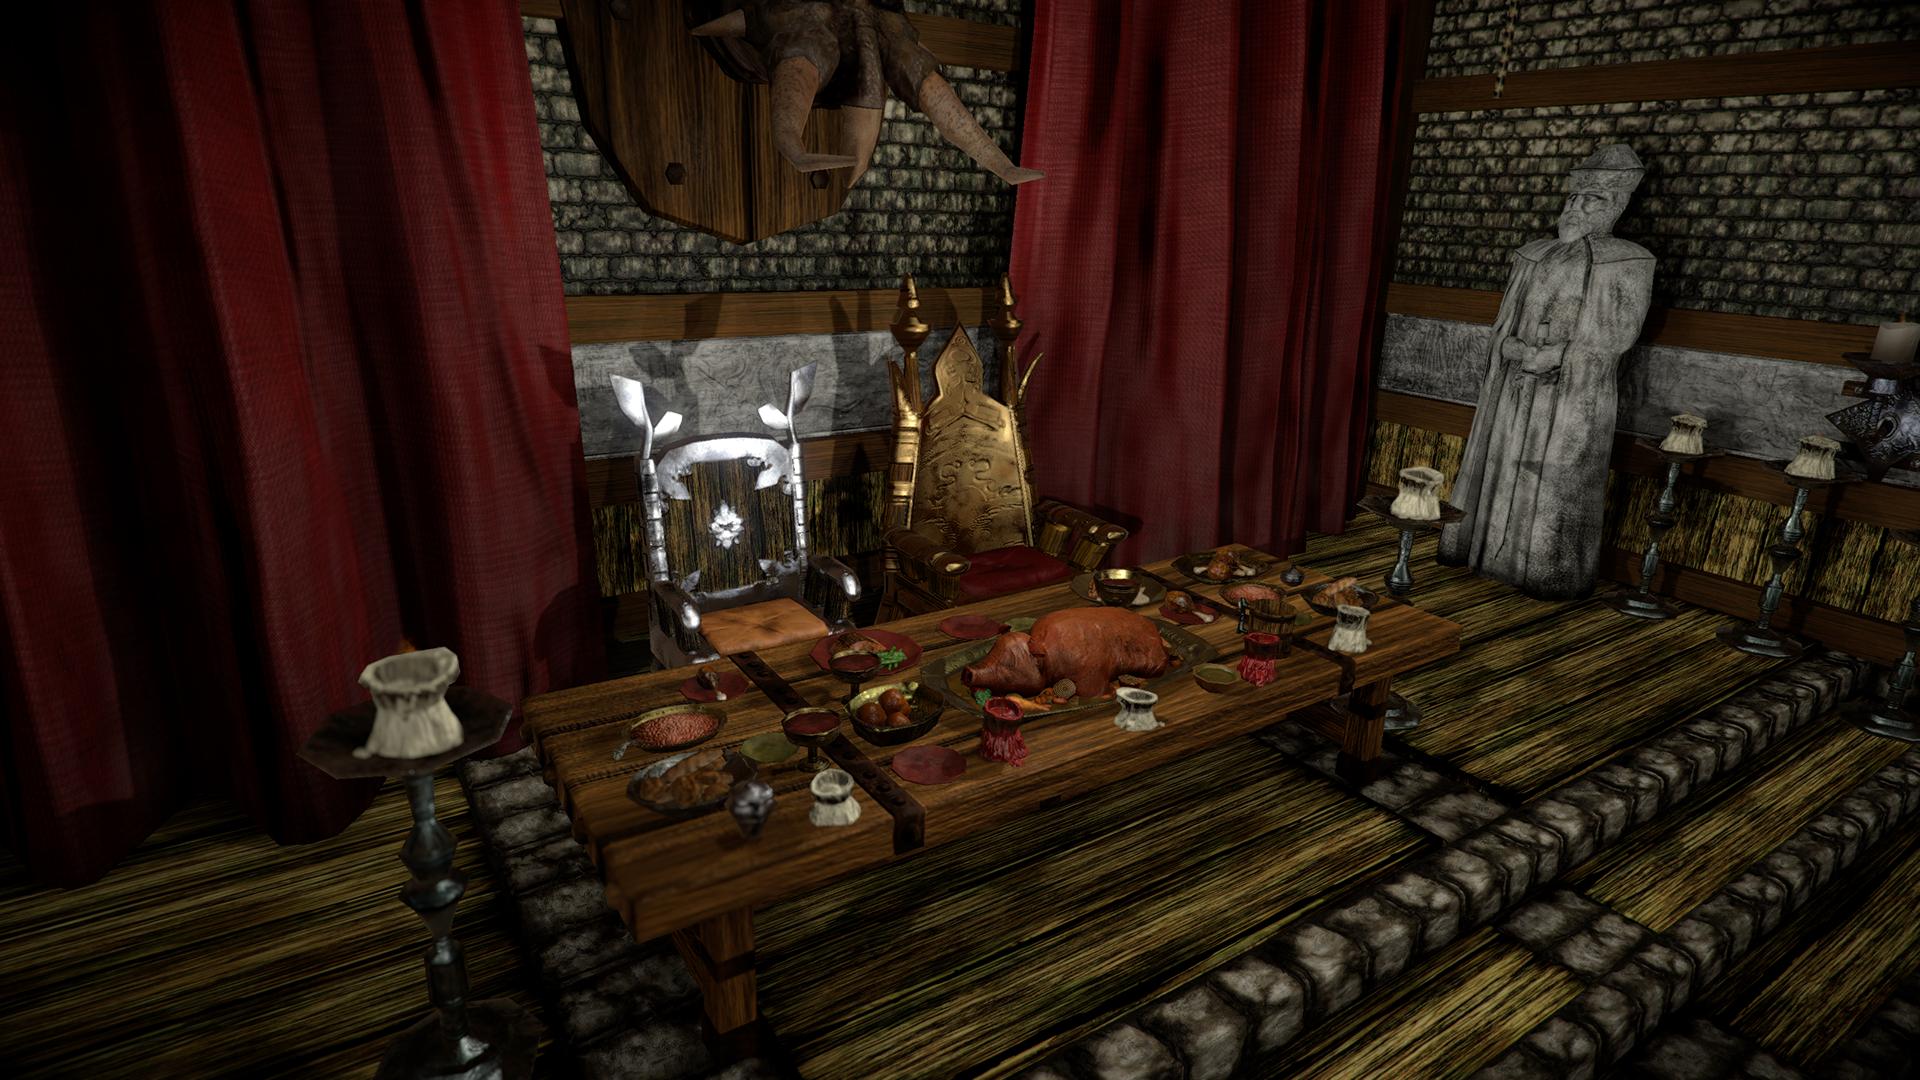 Mythical Dining Hall